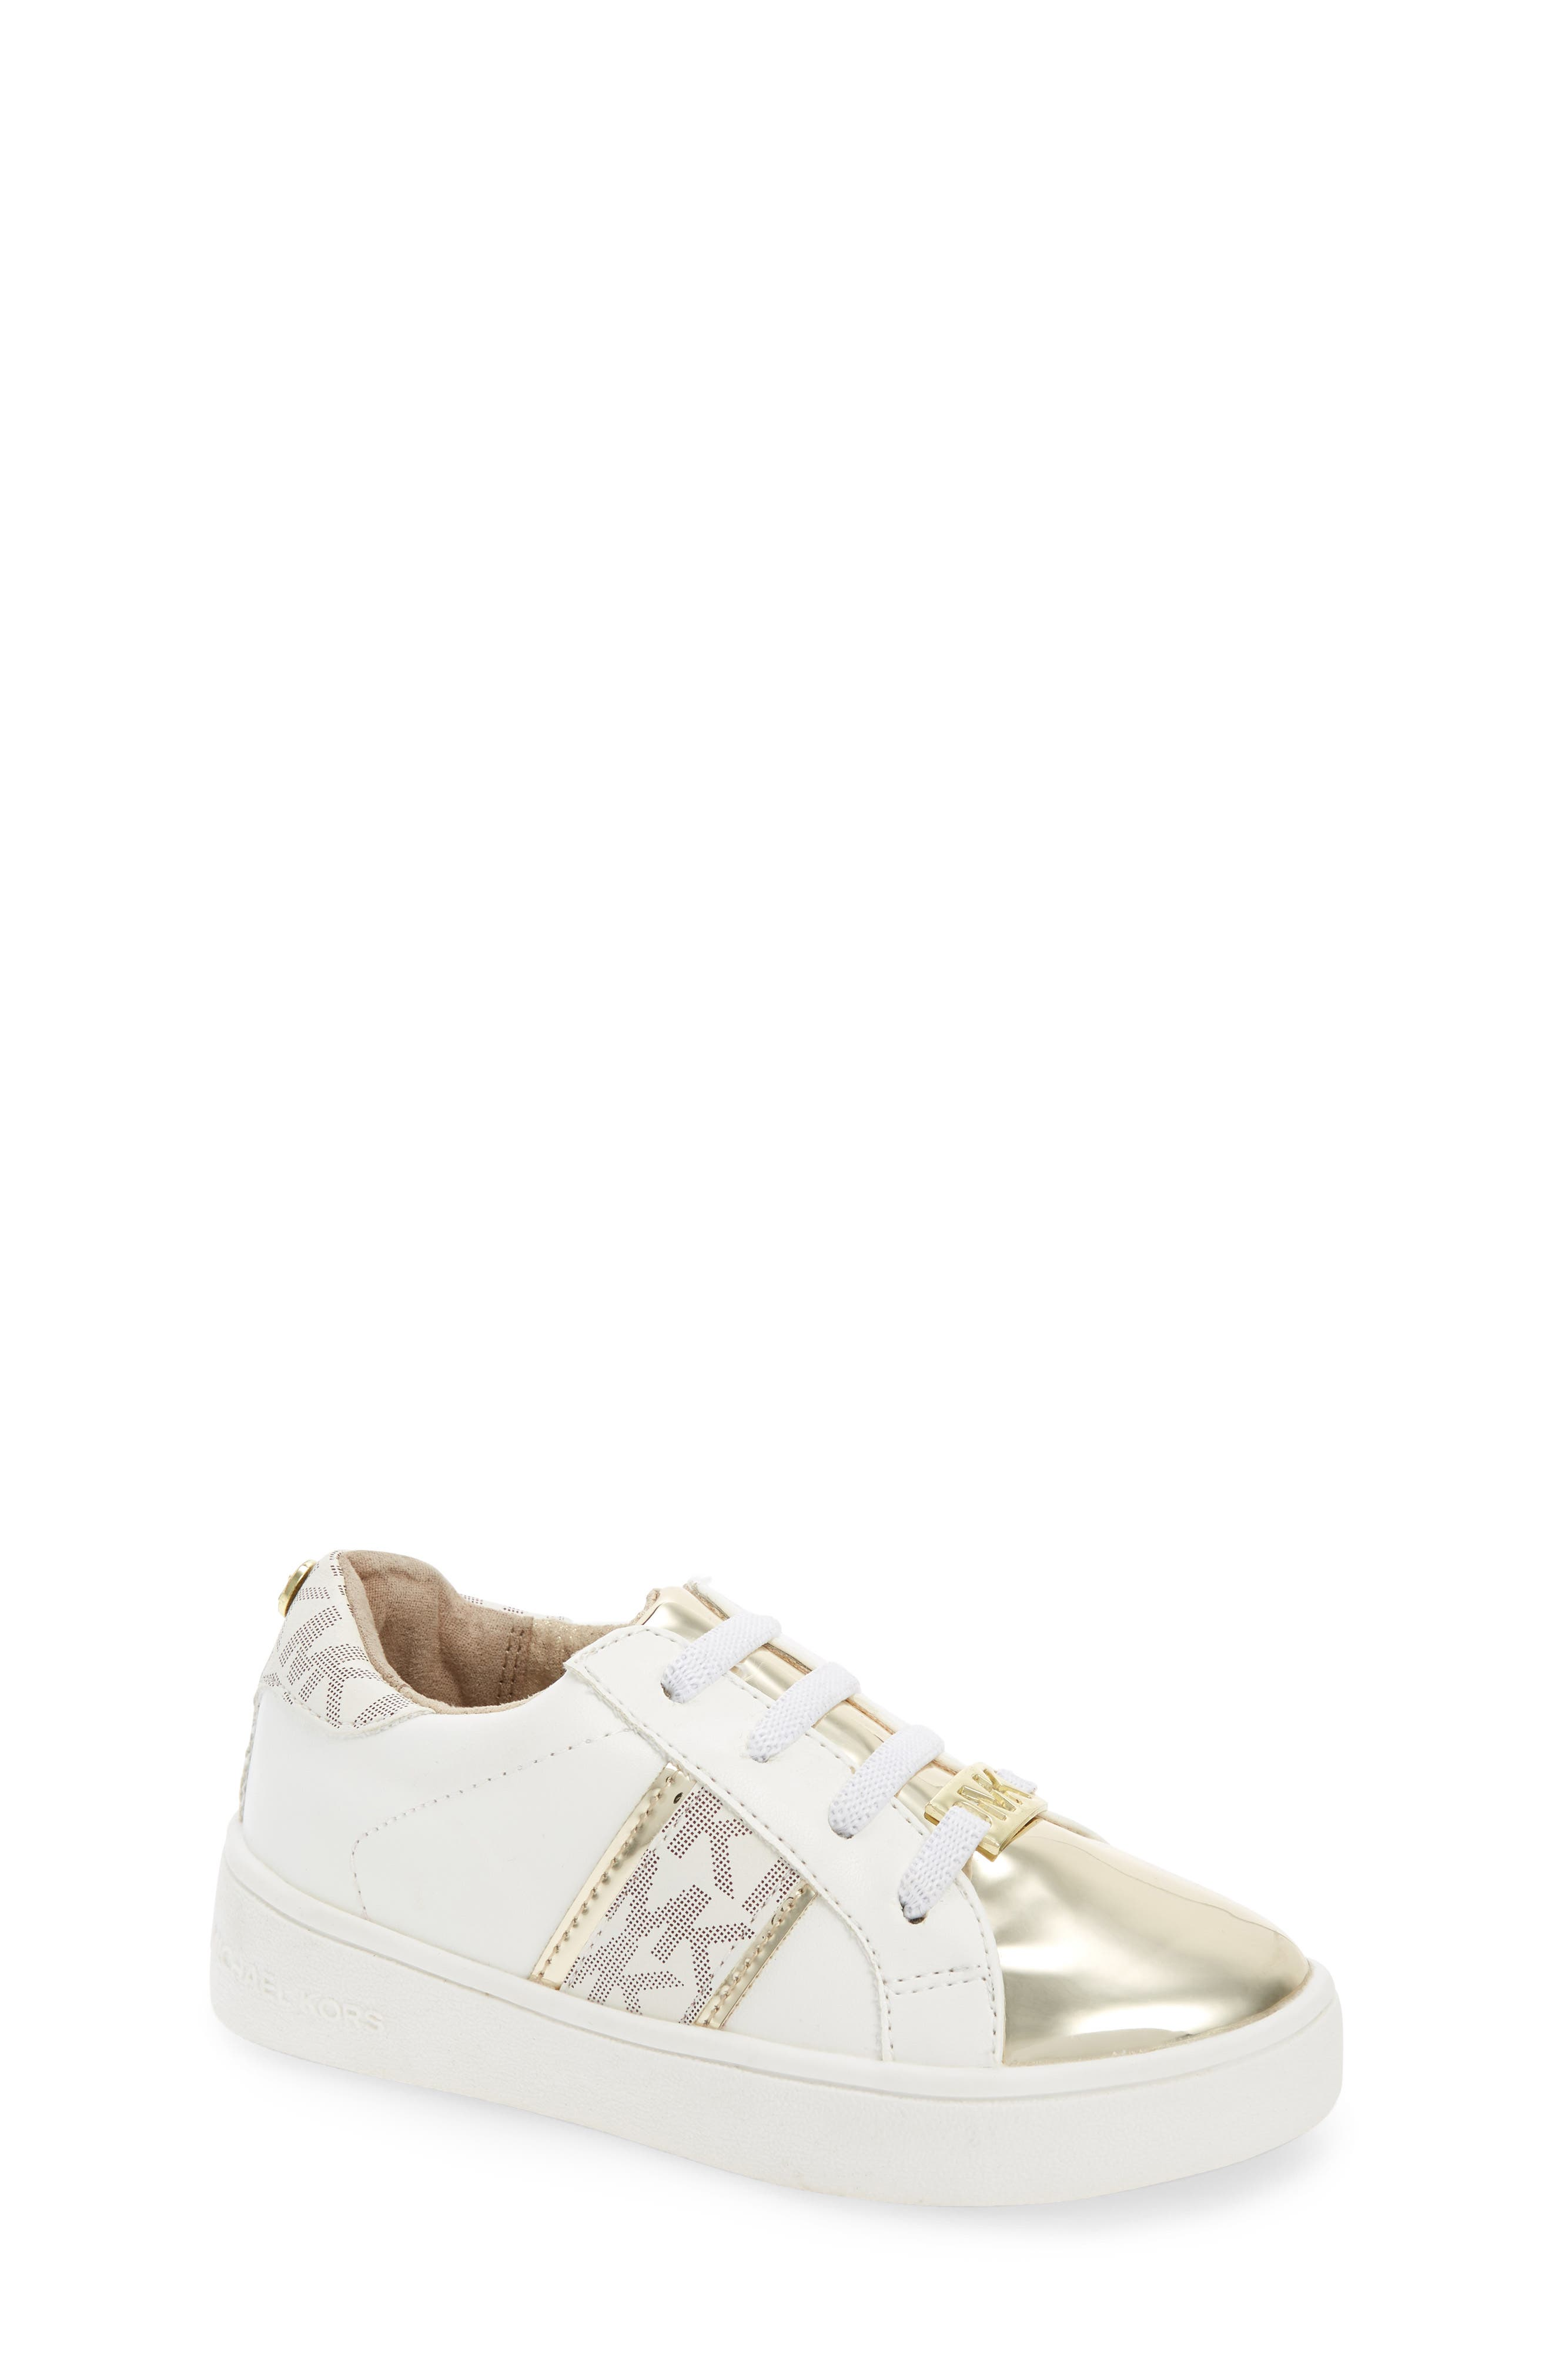 MICHAEL MICHAEL KORS Ivy Frankie Metallic Logo Sneaker, Main, color, 100